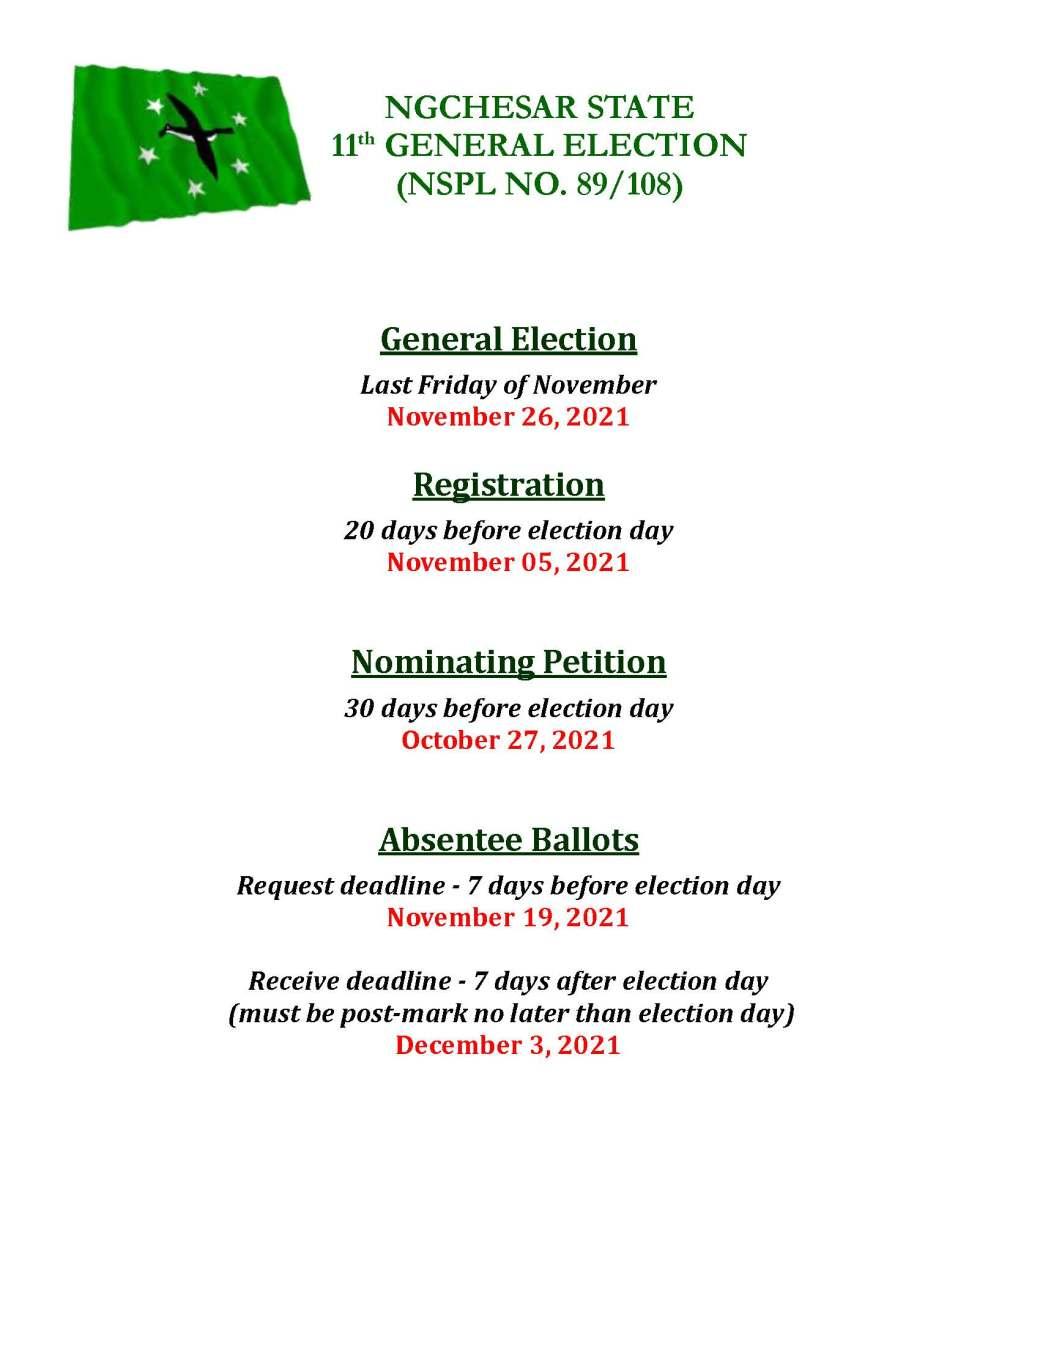 NGCHESAR ELECTION DEADLINE DATES